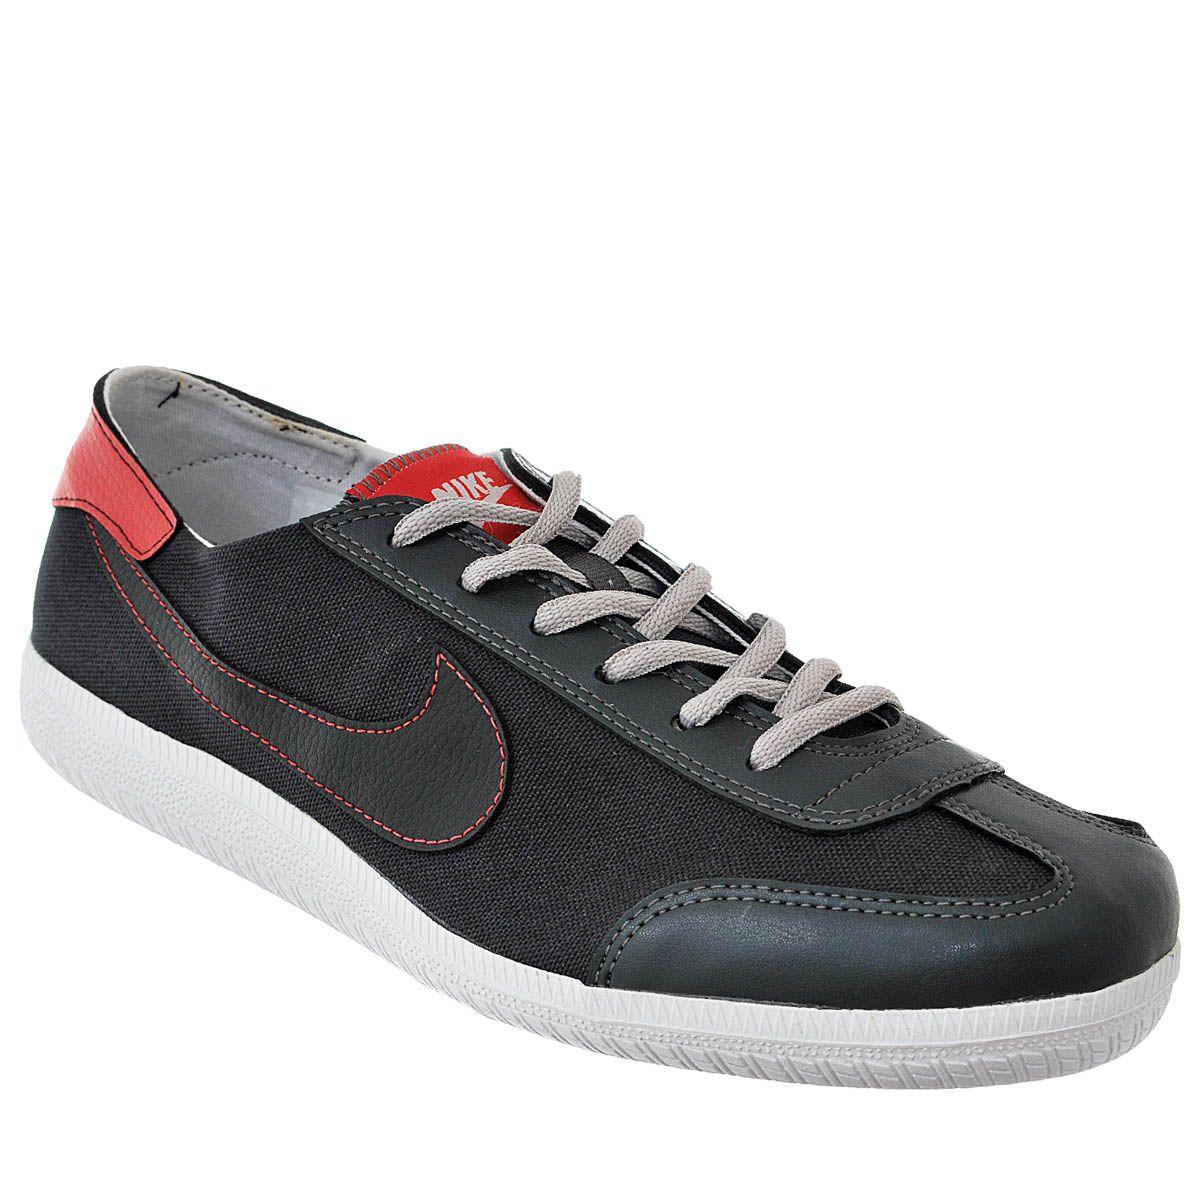 Tenis Nike Post Match casual - Preto